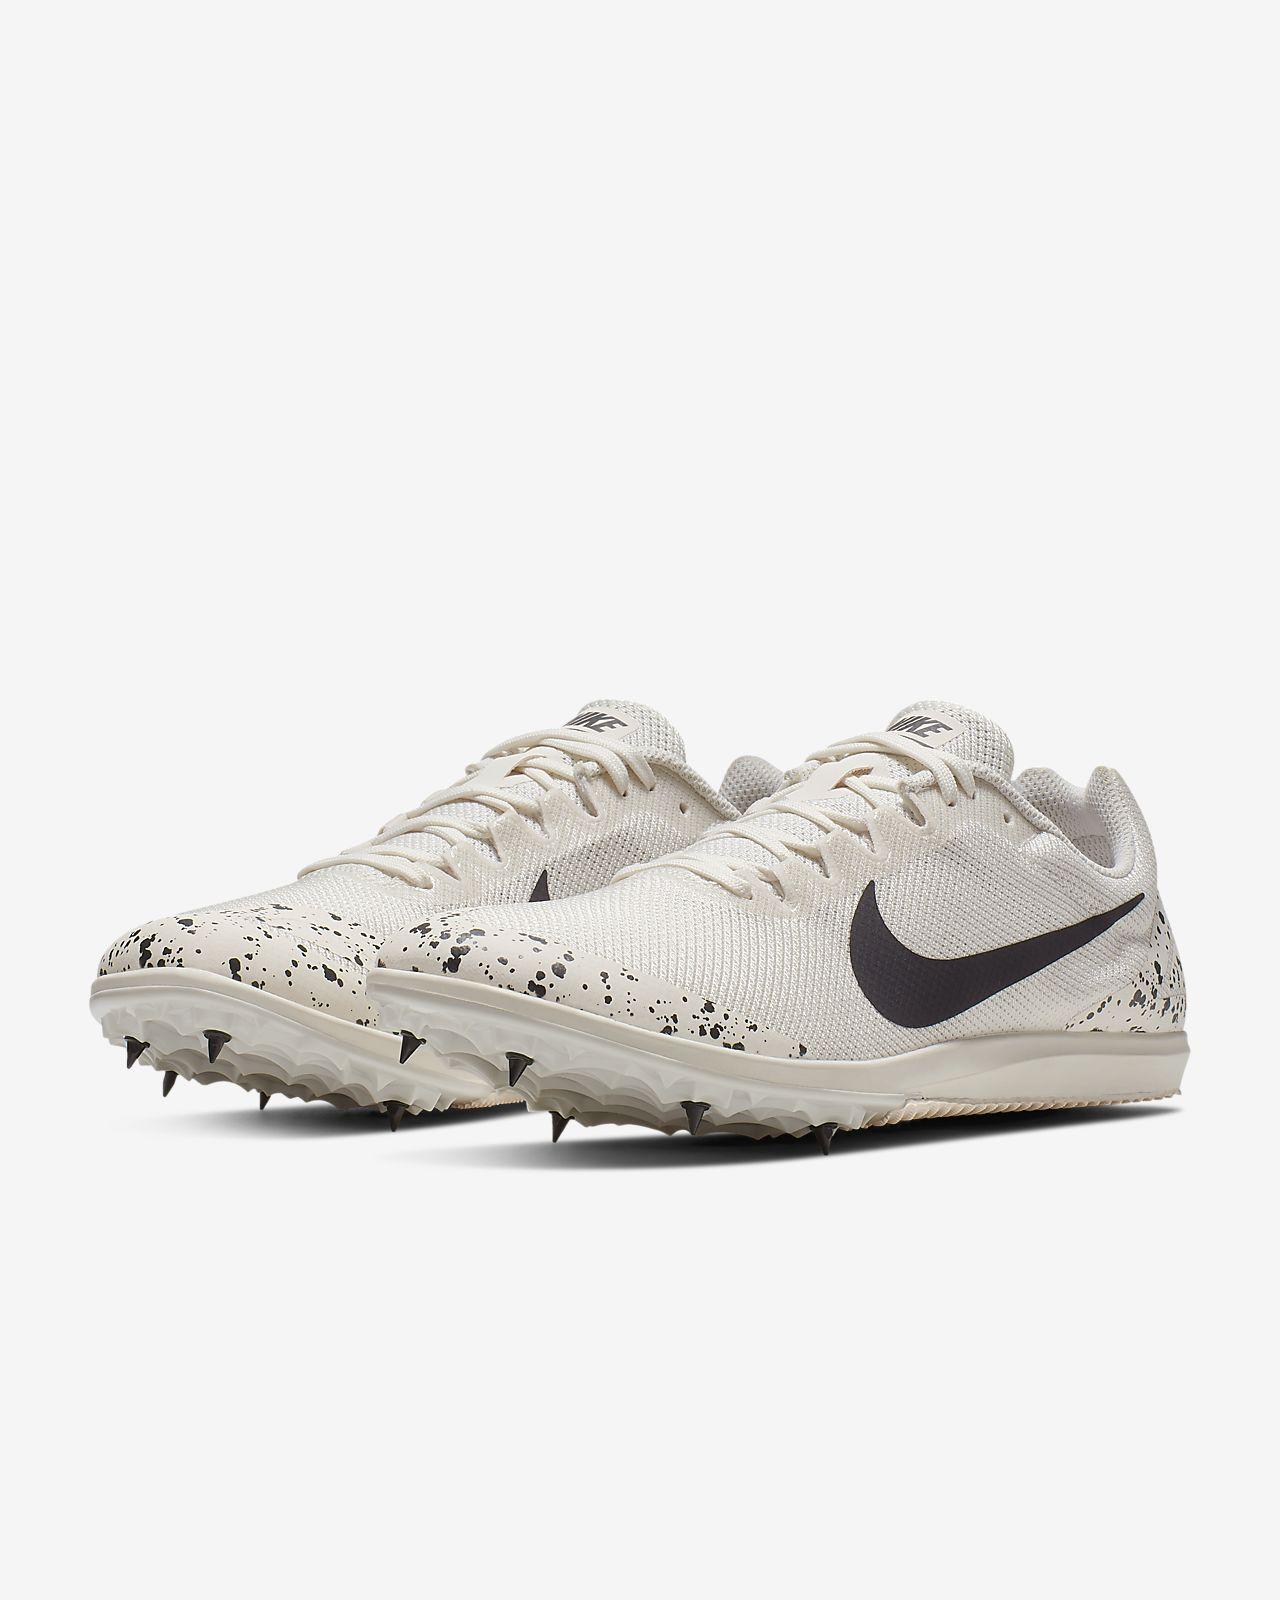 AIR ZOOM ELITE 9 Herren Nike j4c3s|28710 Schwarz [j4c3s